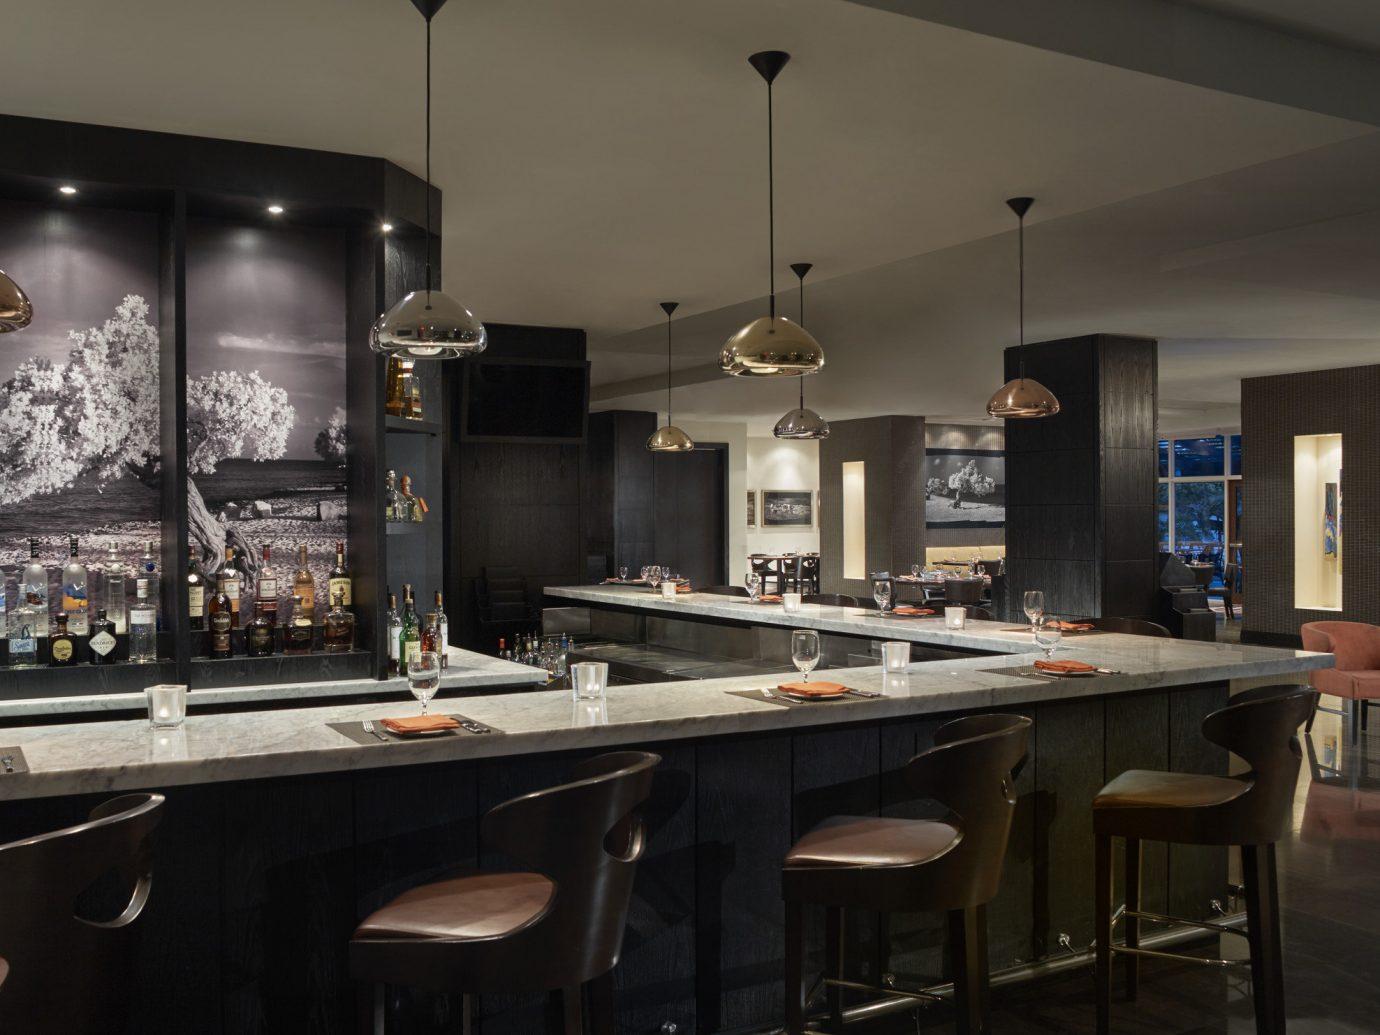 Aruba caribbean Hotels table indoor floor countertop ceiling Kitchen interior design area Island furniture